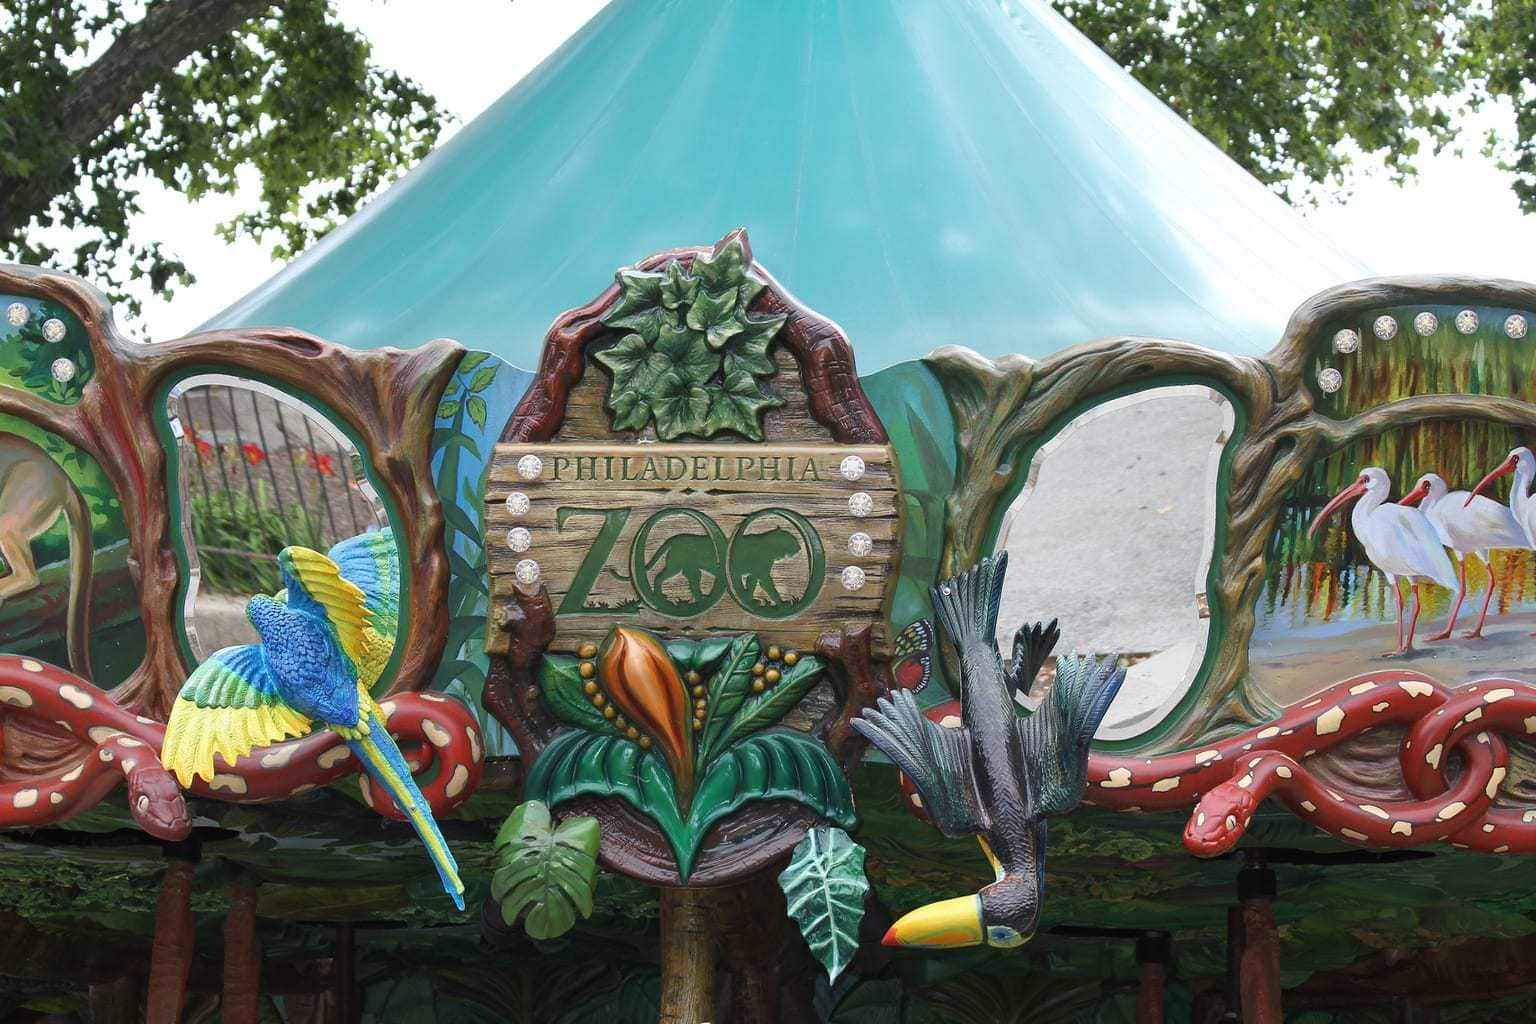 Philadelphia Zoo, Things to do in Pennsylvania